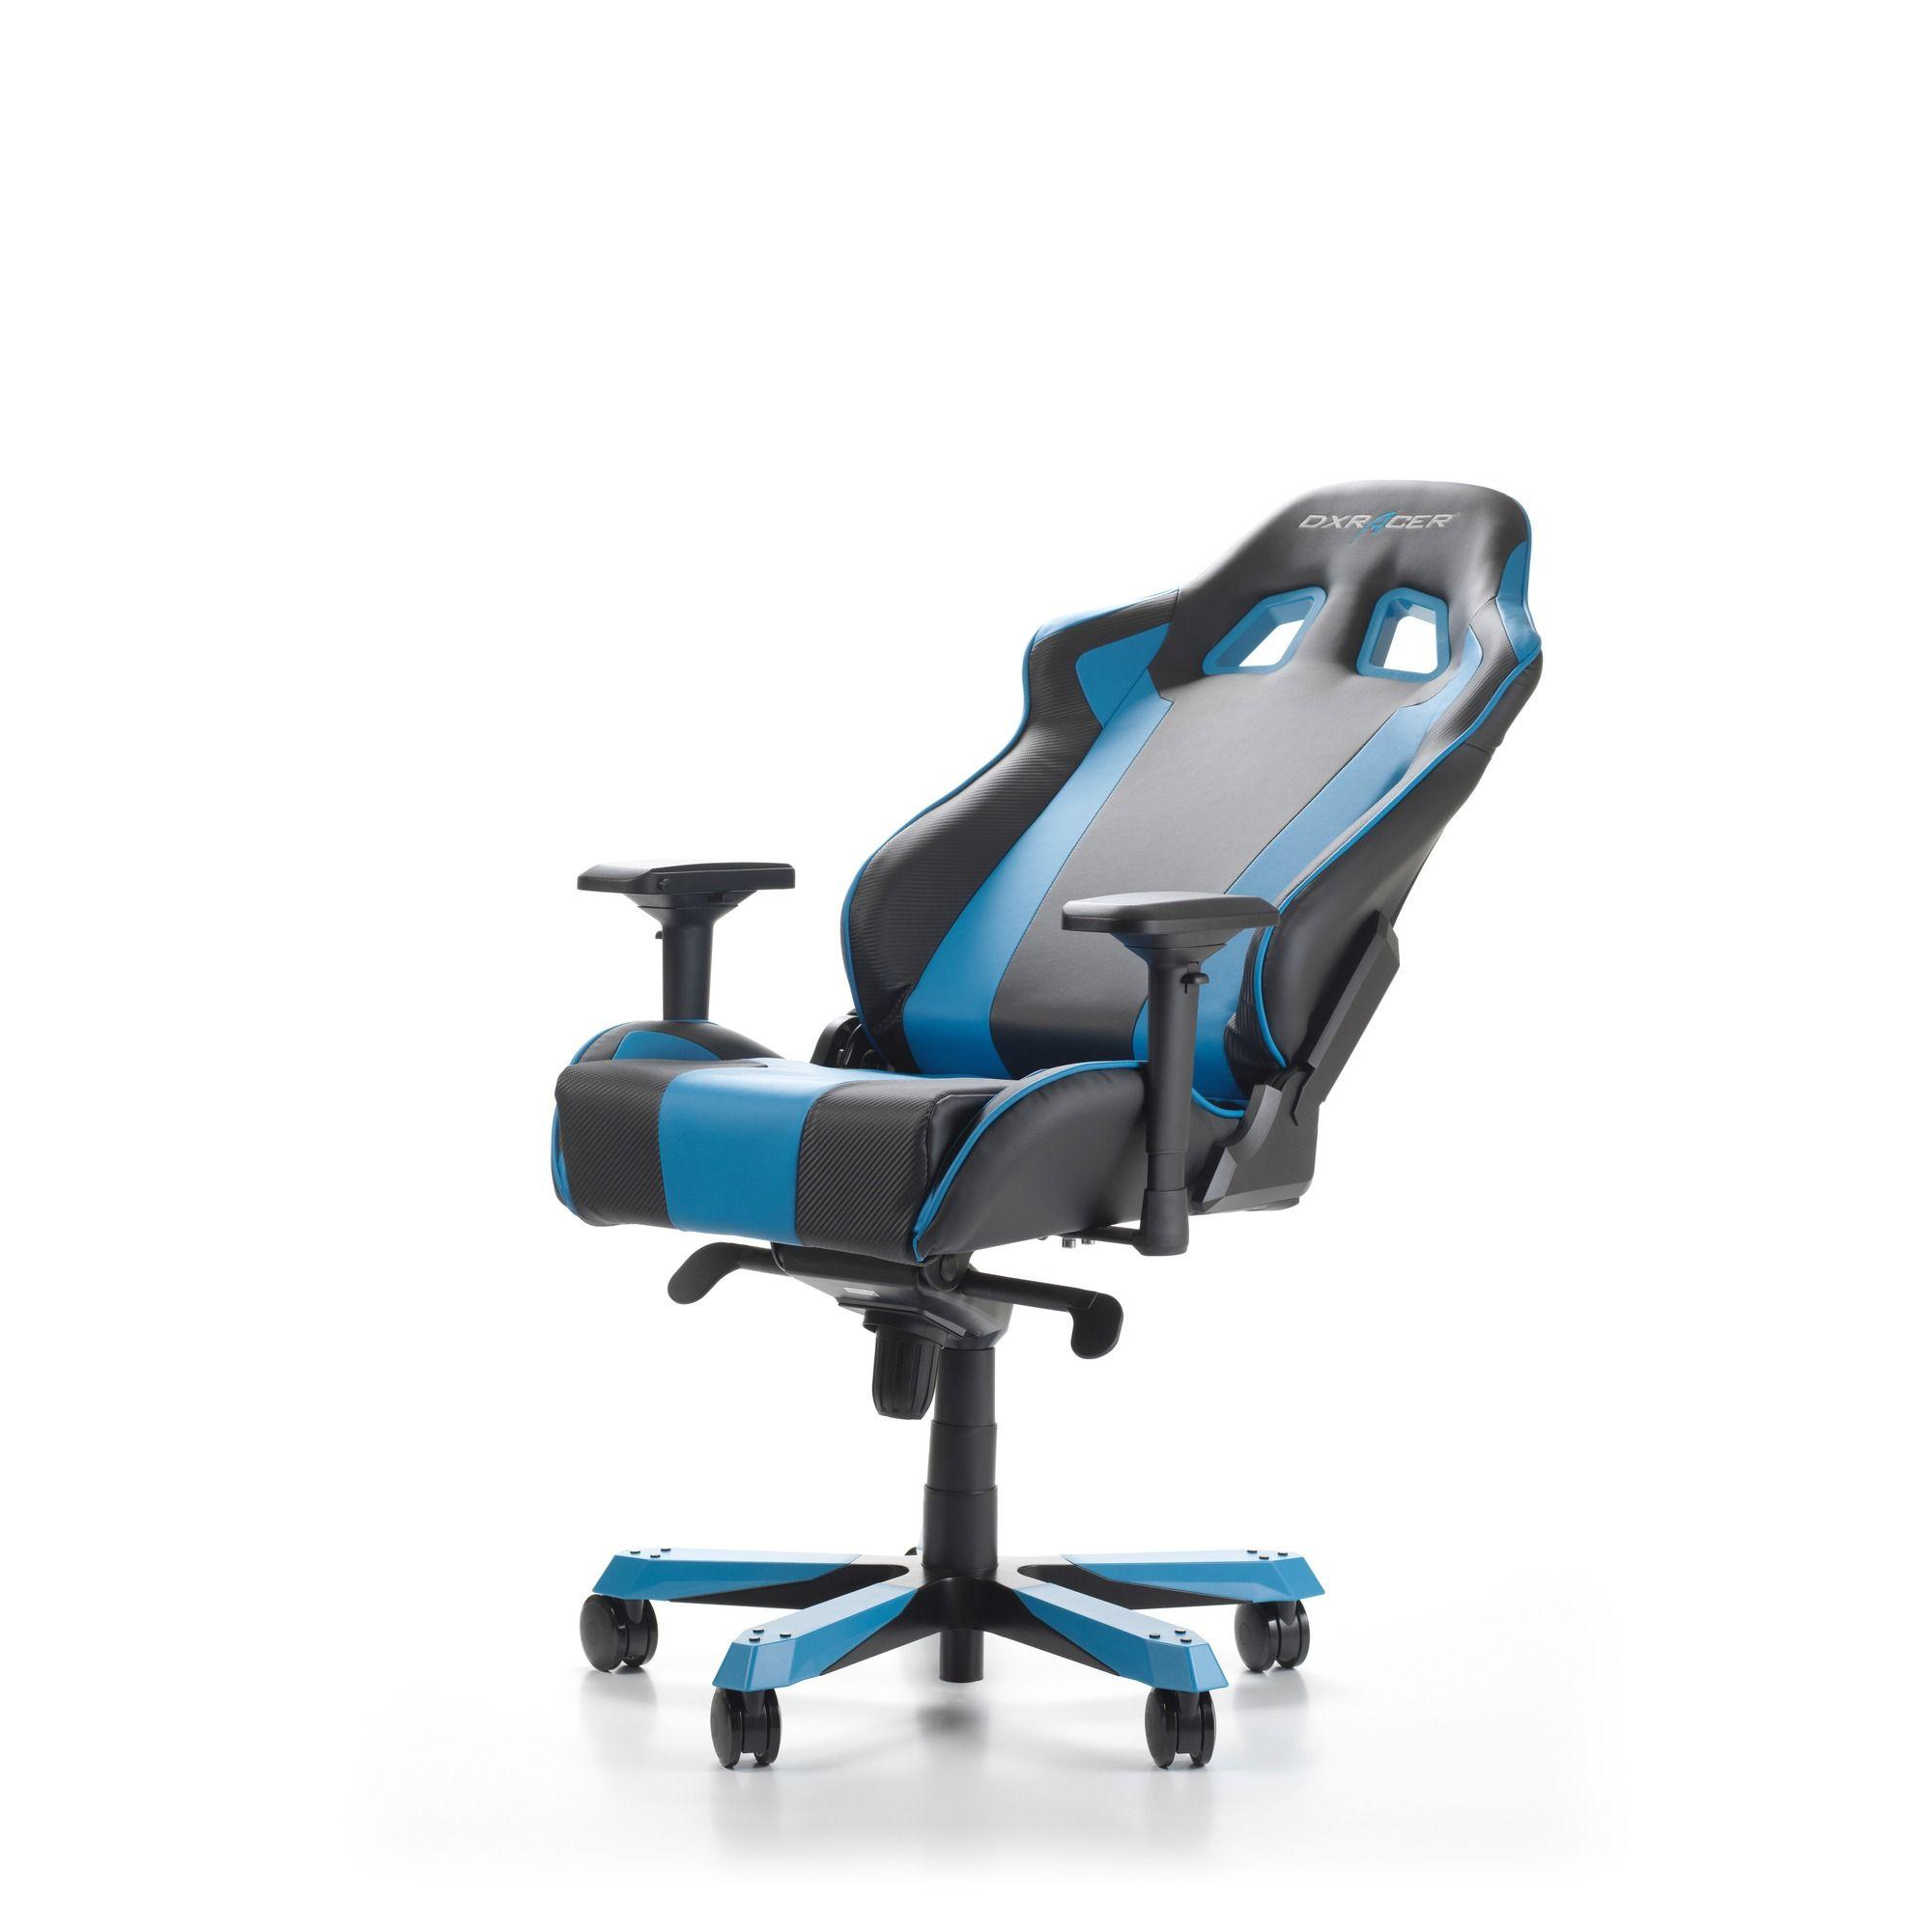 Геймърски стол DXRacer - серия KING, черен/син - OH/KS06/NB - 6